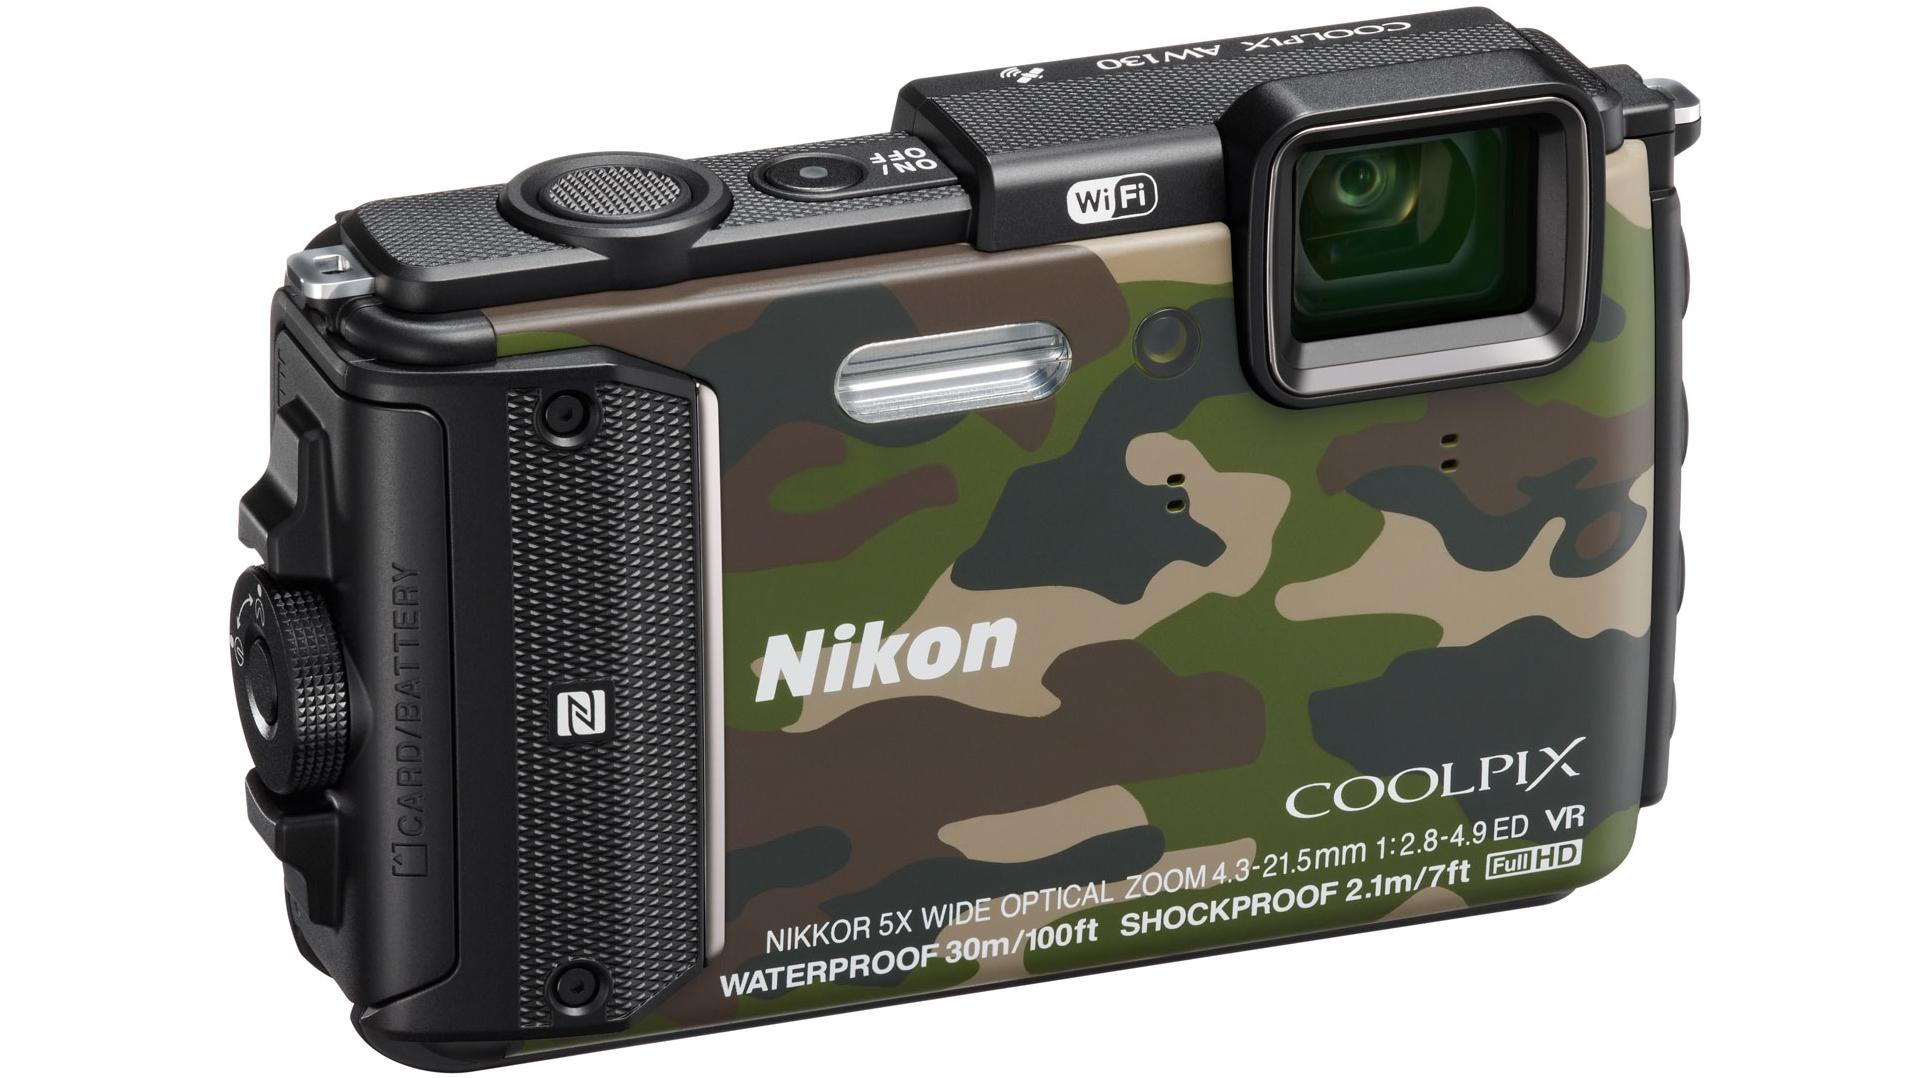 Nikon Coolpix AW130 Camouflage - (16.76 млн, оптический zoom: 5x, 1920x1080, 7 кадр./сек, 921000 точек, 3 дюйма)